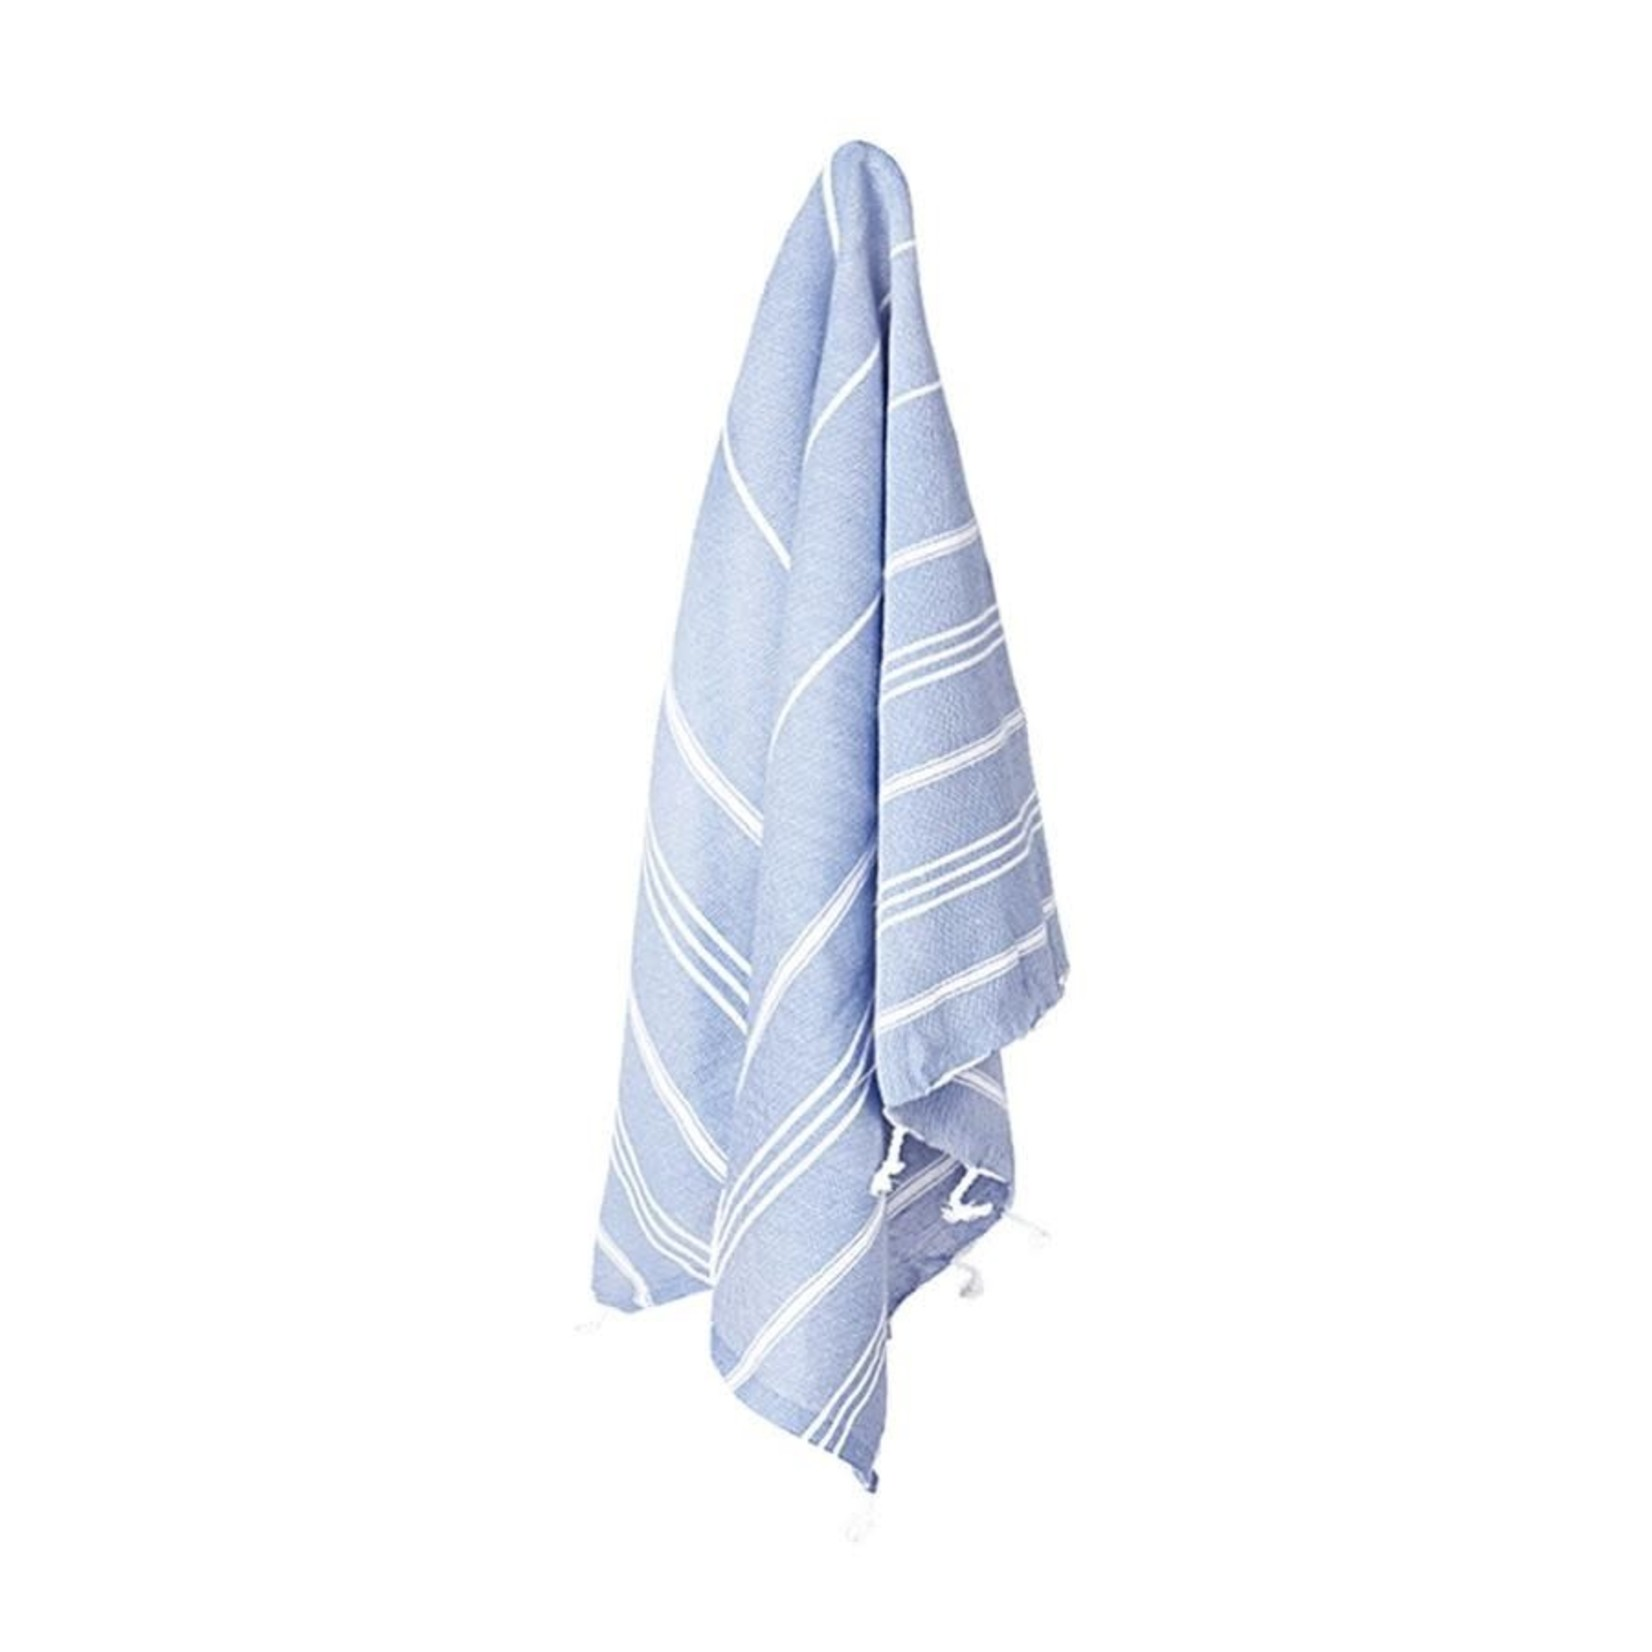 STRAY + WANDER MARIN SMALL TOWEL - TRUE BLUE